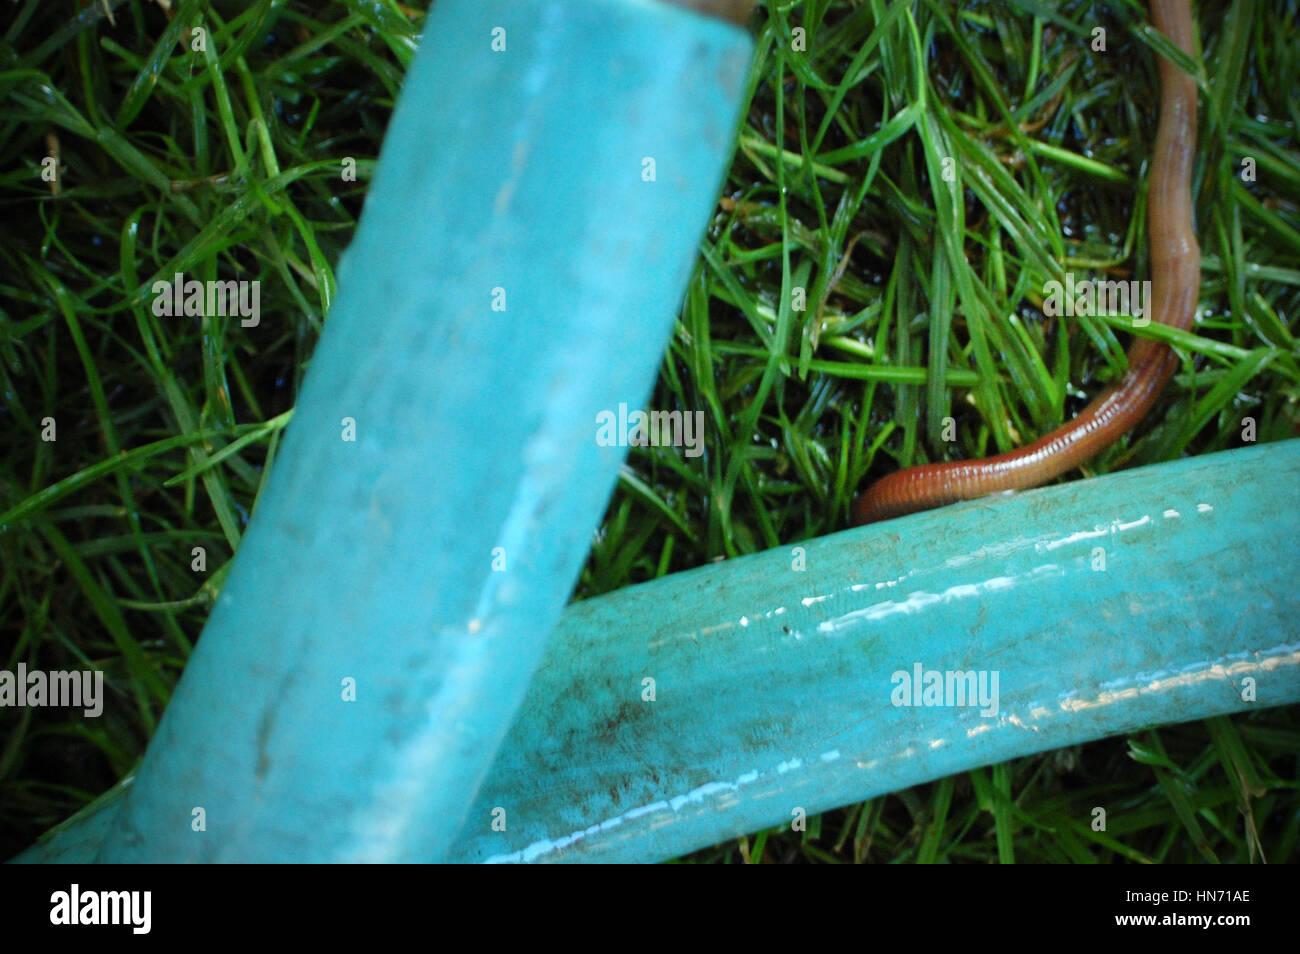 soak hose garden stock photos u0026 soak hose garden stock images alamy